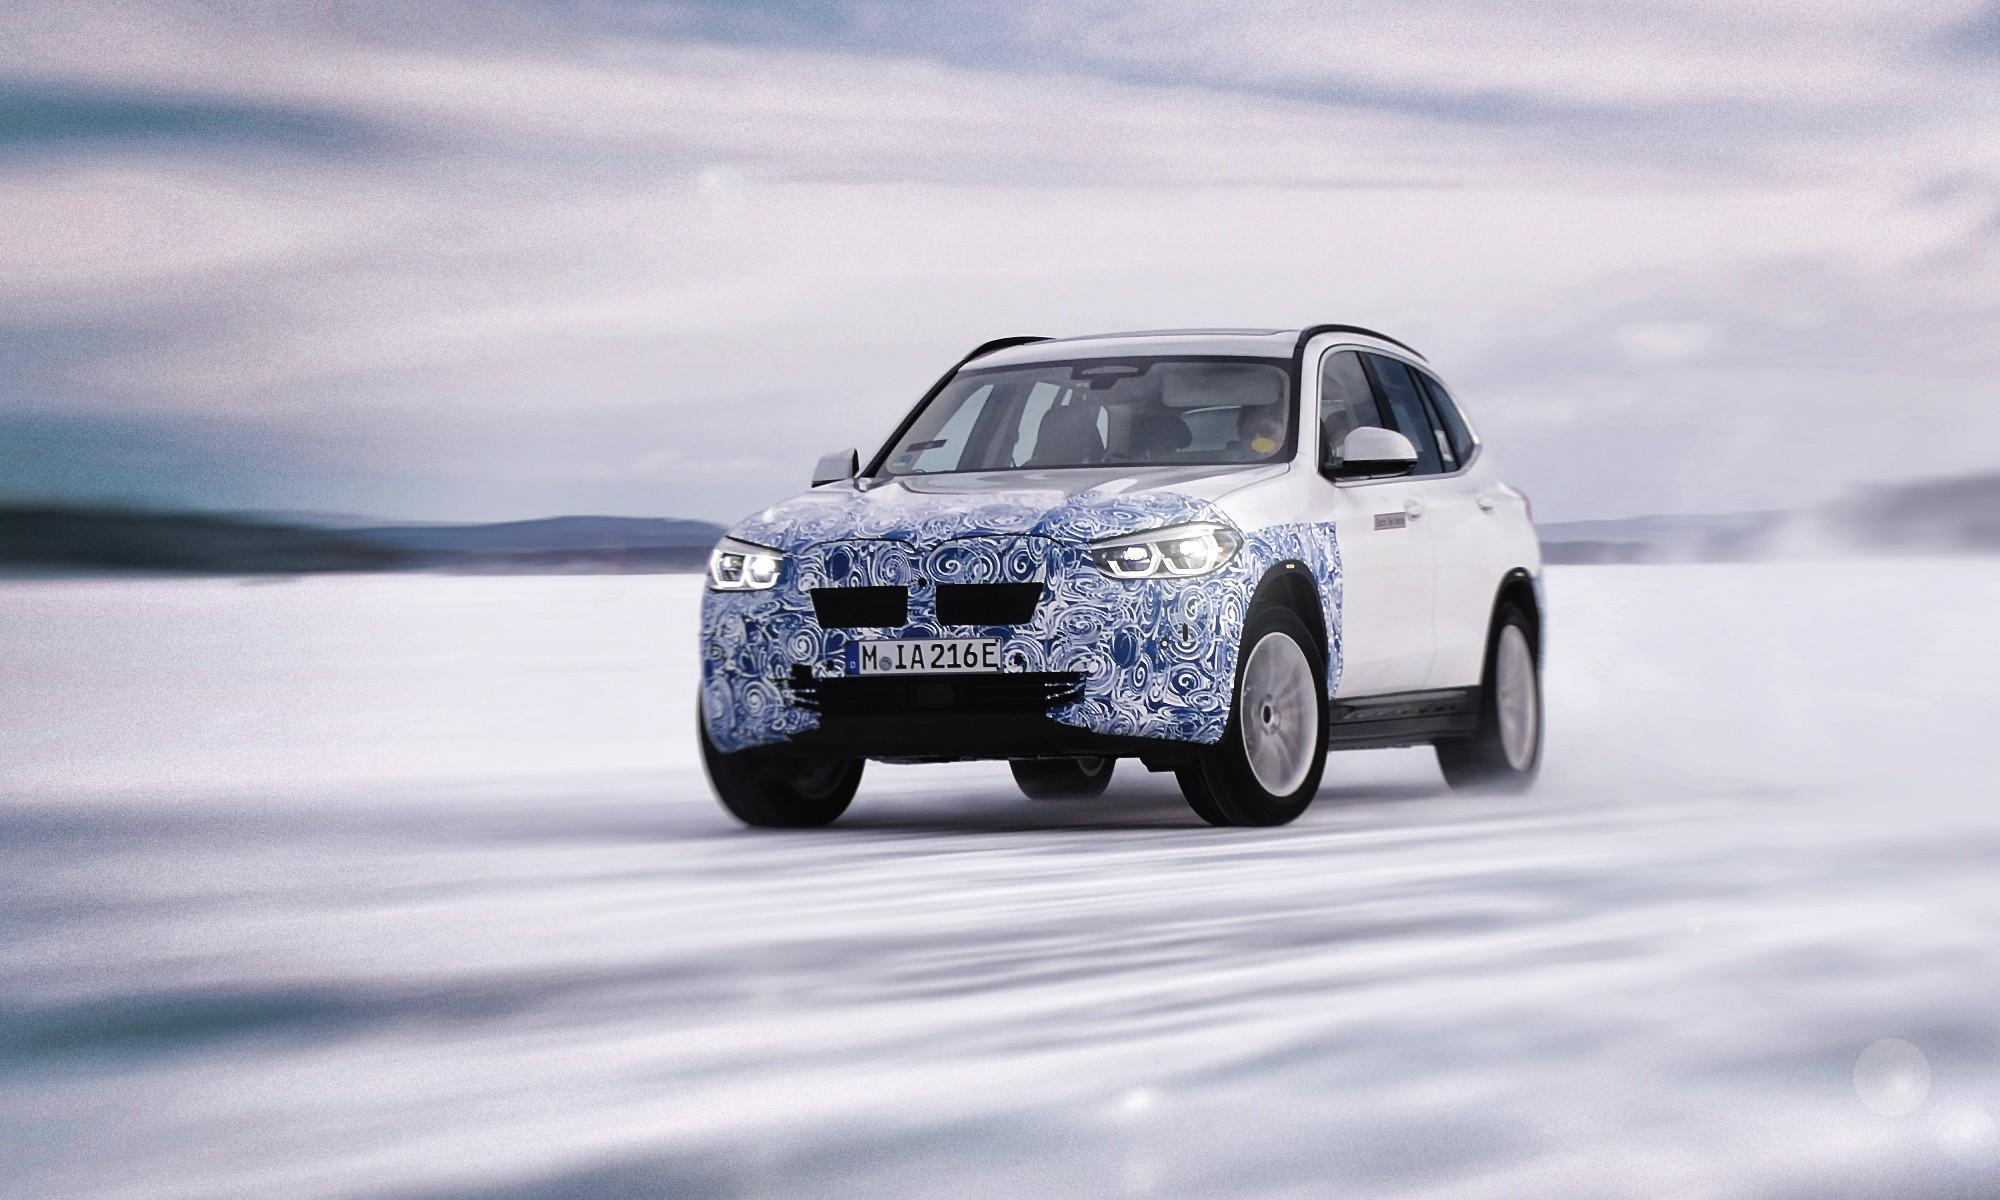 BMW iX3 undergoing testing